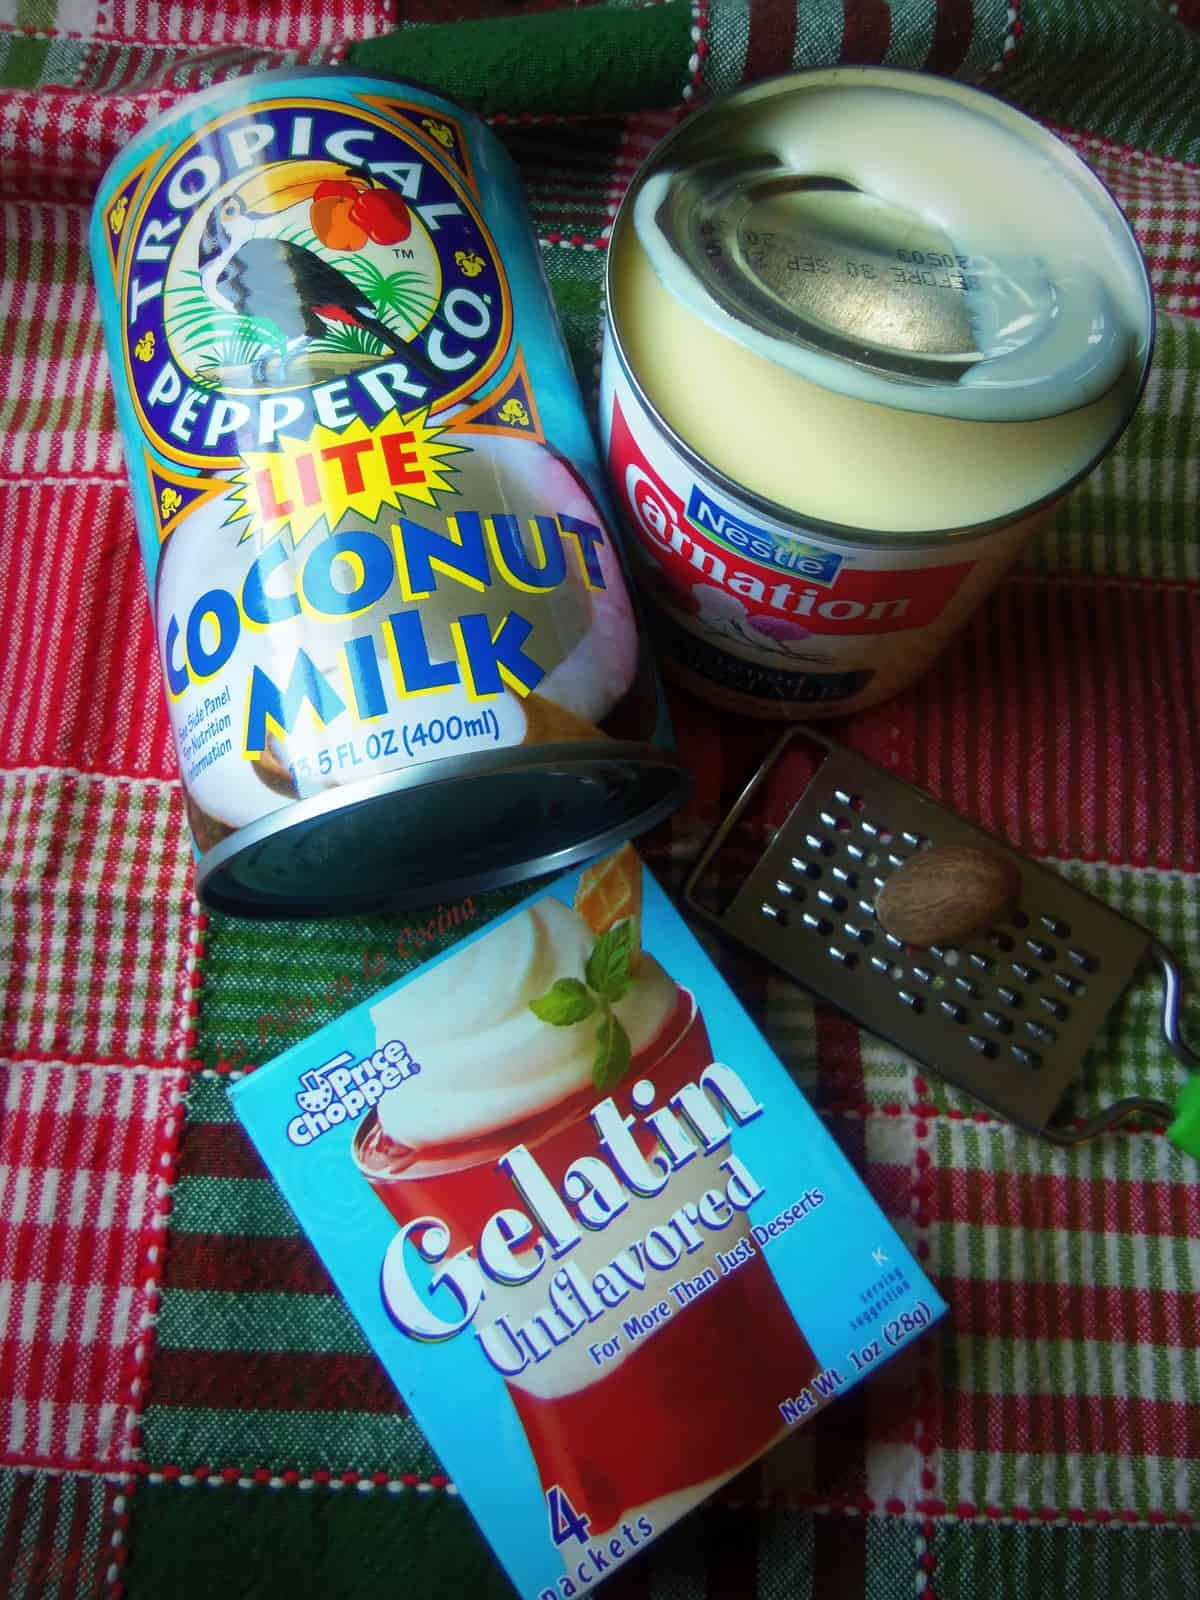 A few simple ingredients, lite coconut milk, sweetened condensed milk, unflavored gelatin and freshly grated nutmeg...